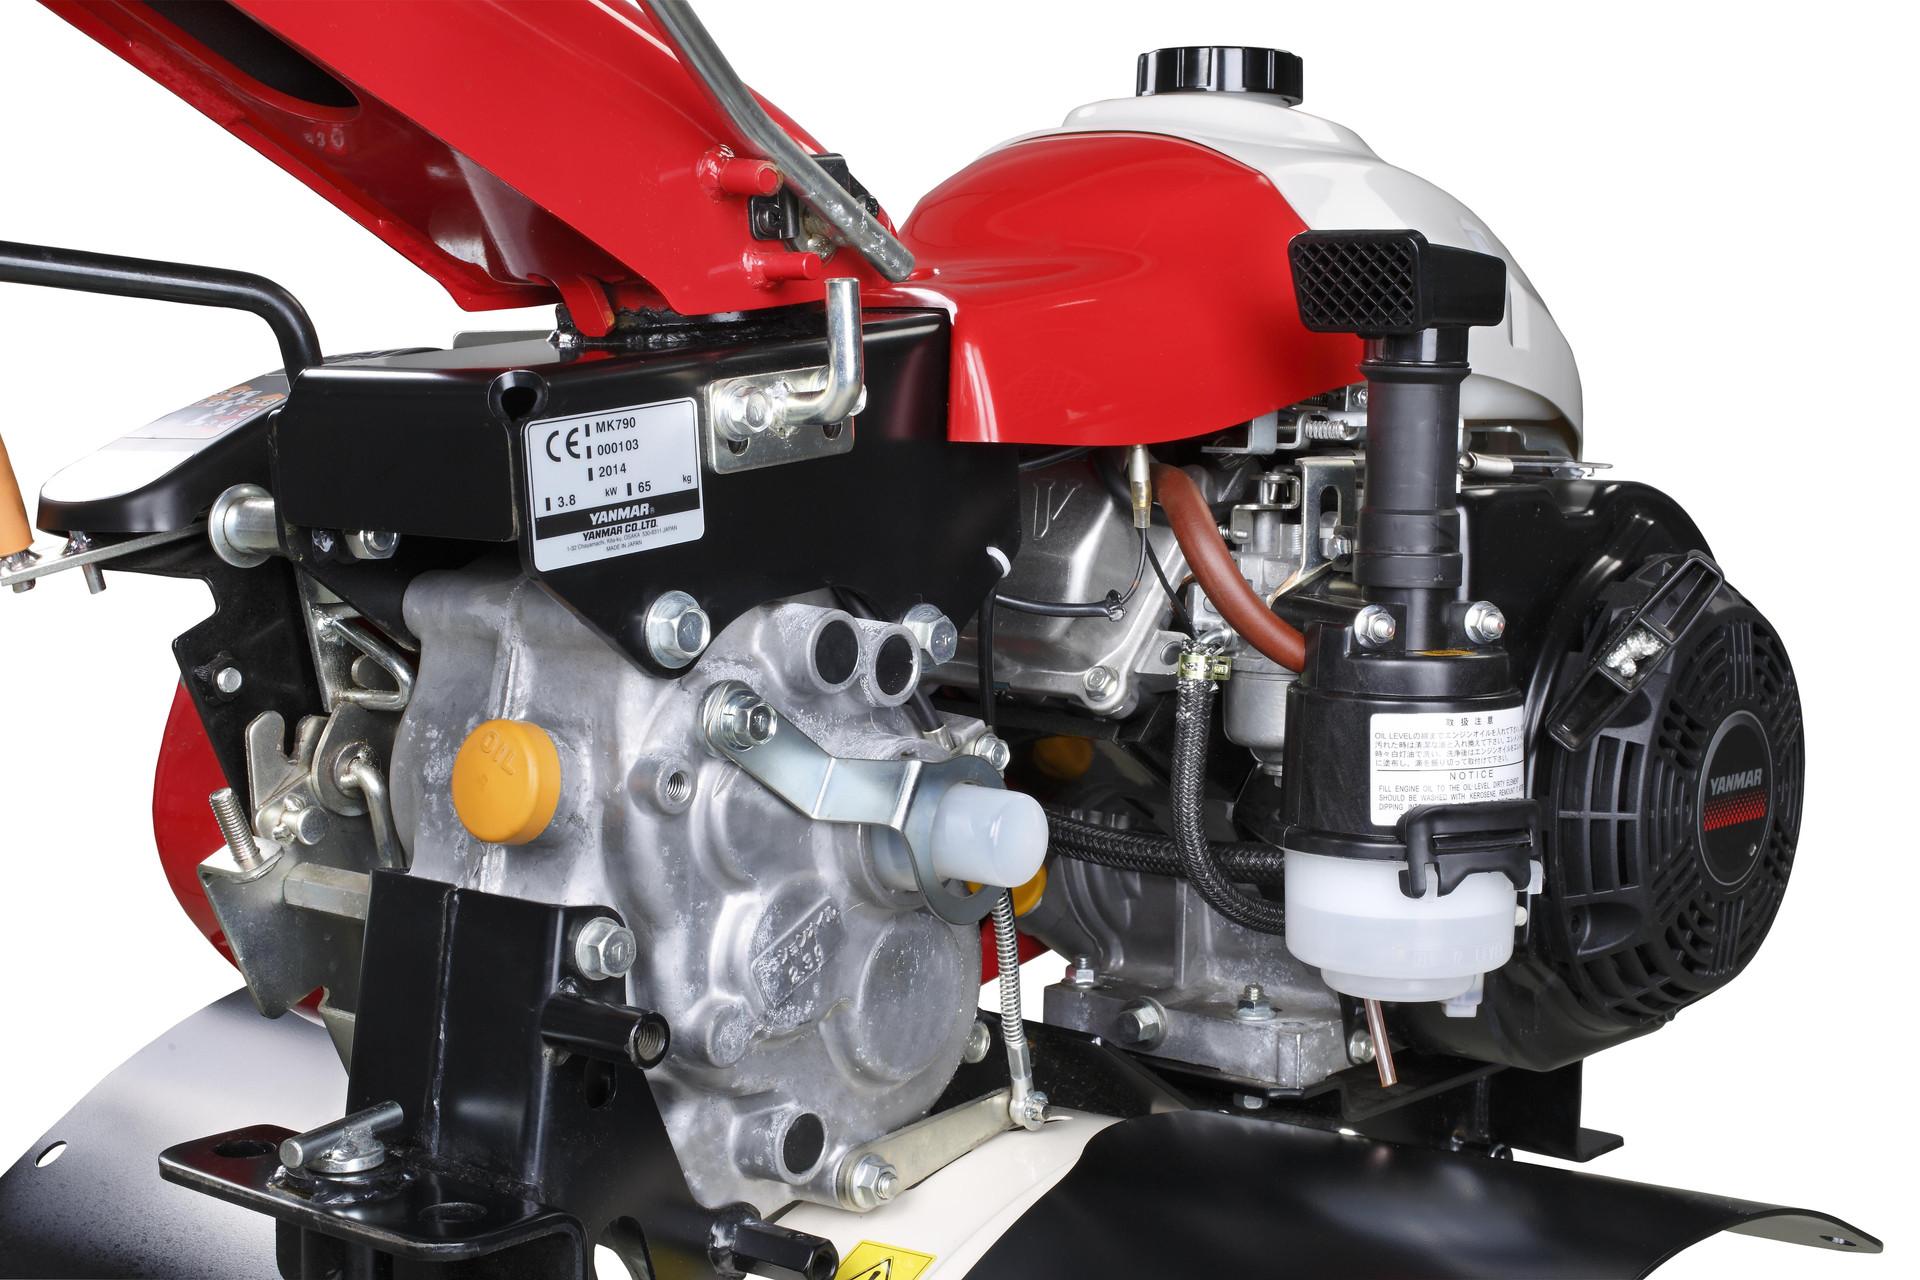 MK790_flat_transmission_PTO_oilbath-0142